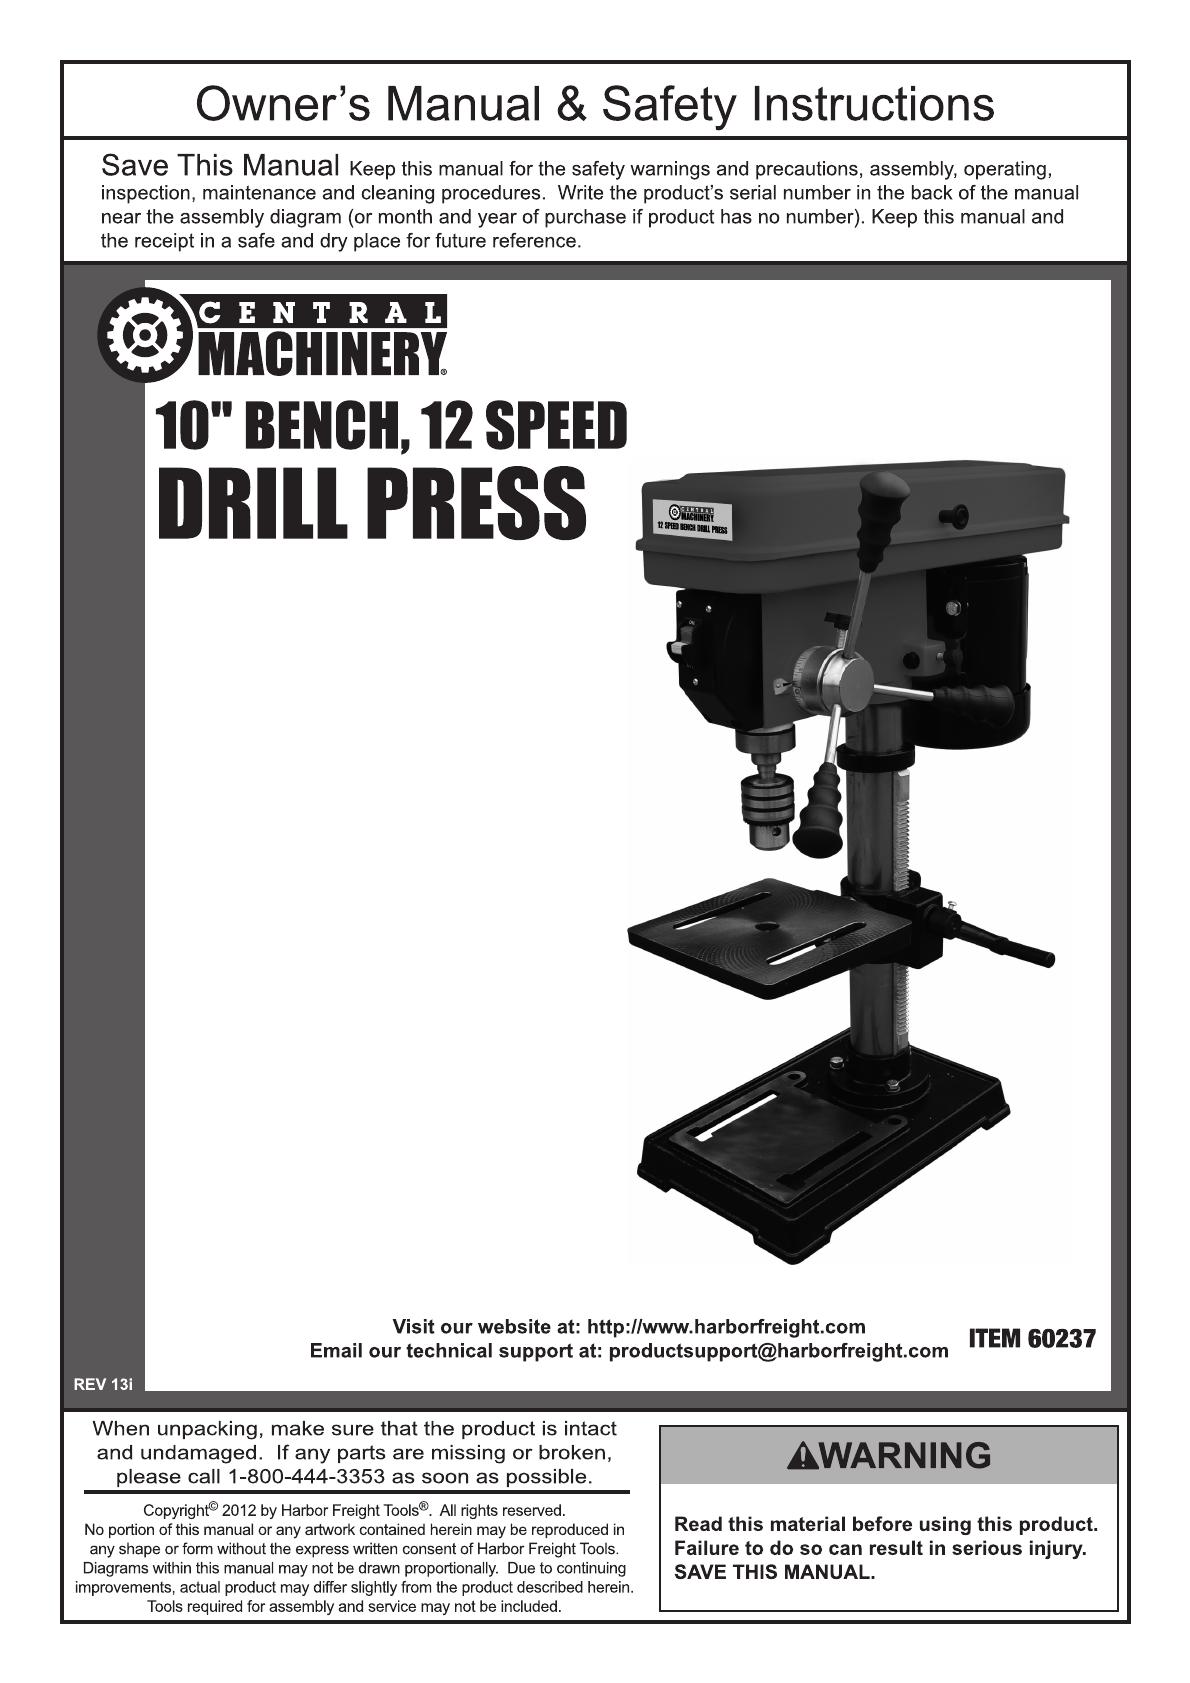 NEW DRIVE BELT SET FOR CENTRAL MACHINERY DRILL PRESS MODEL 60237 DRILL PRESS